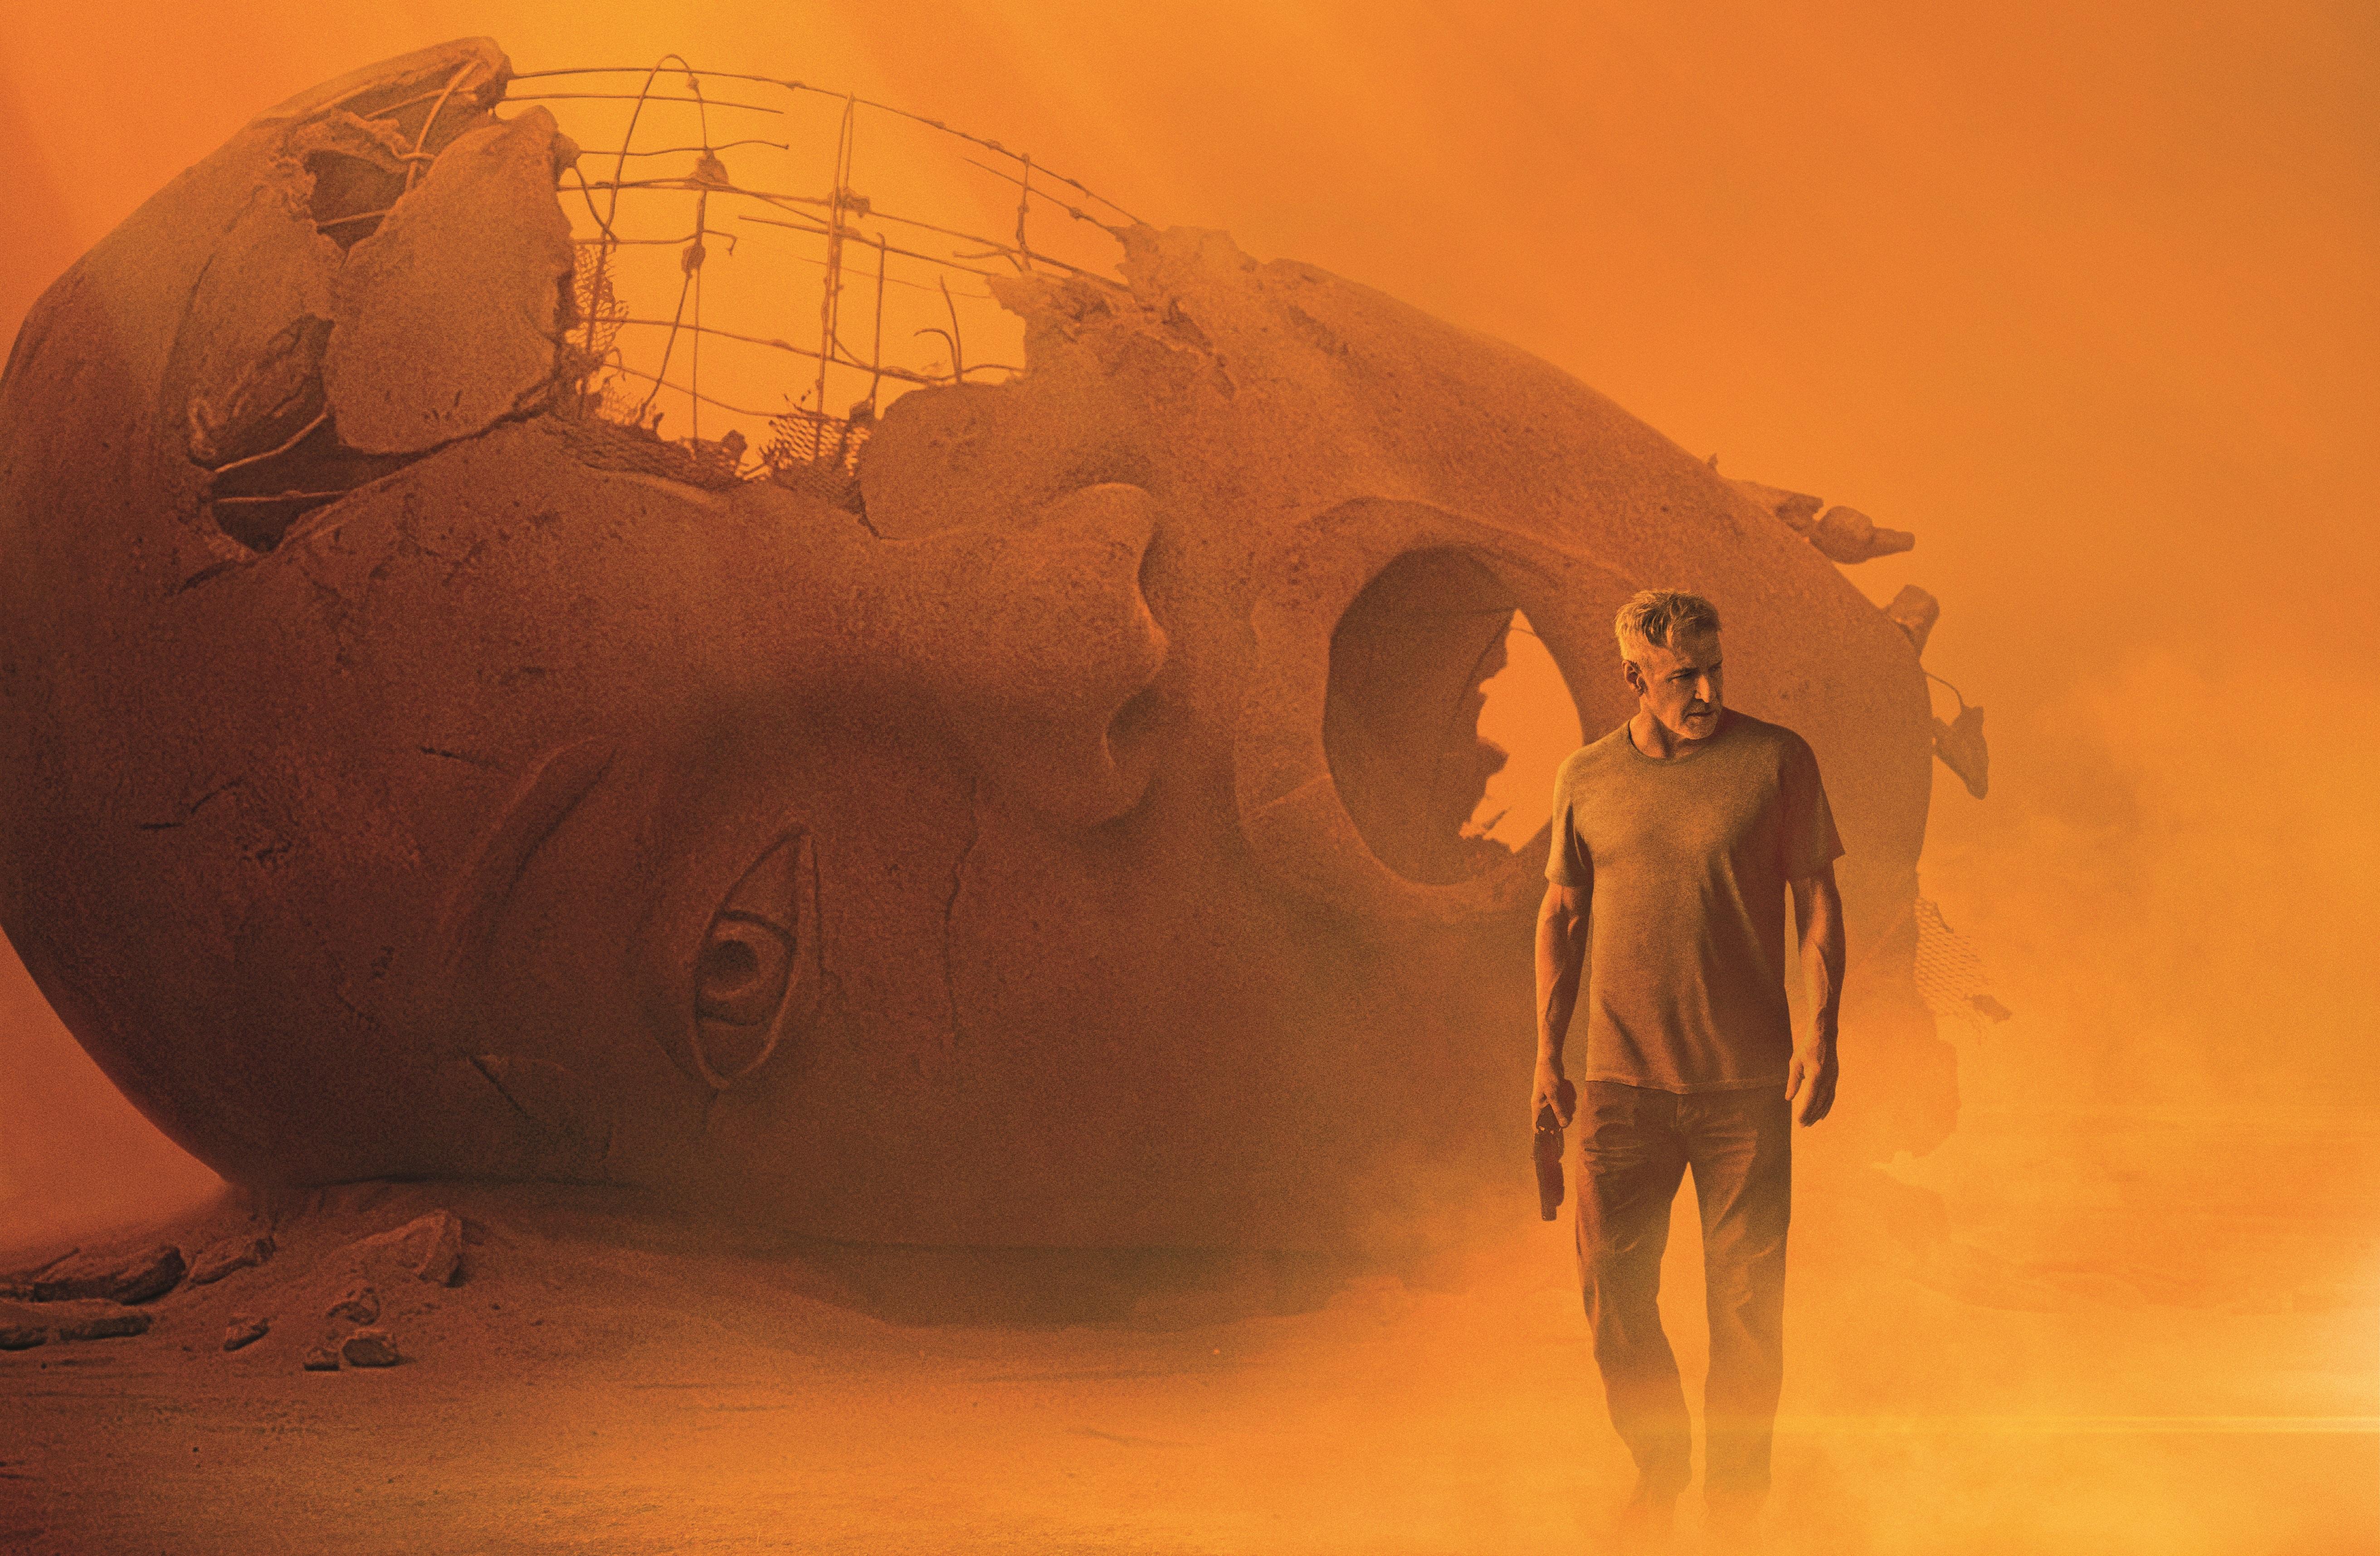 Blade Runner 2049 5k Retina Ultra HD Wallpaper ...